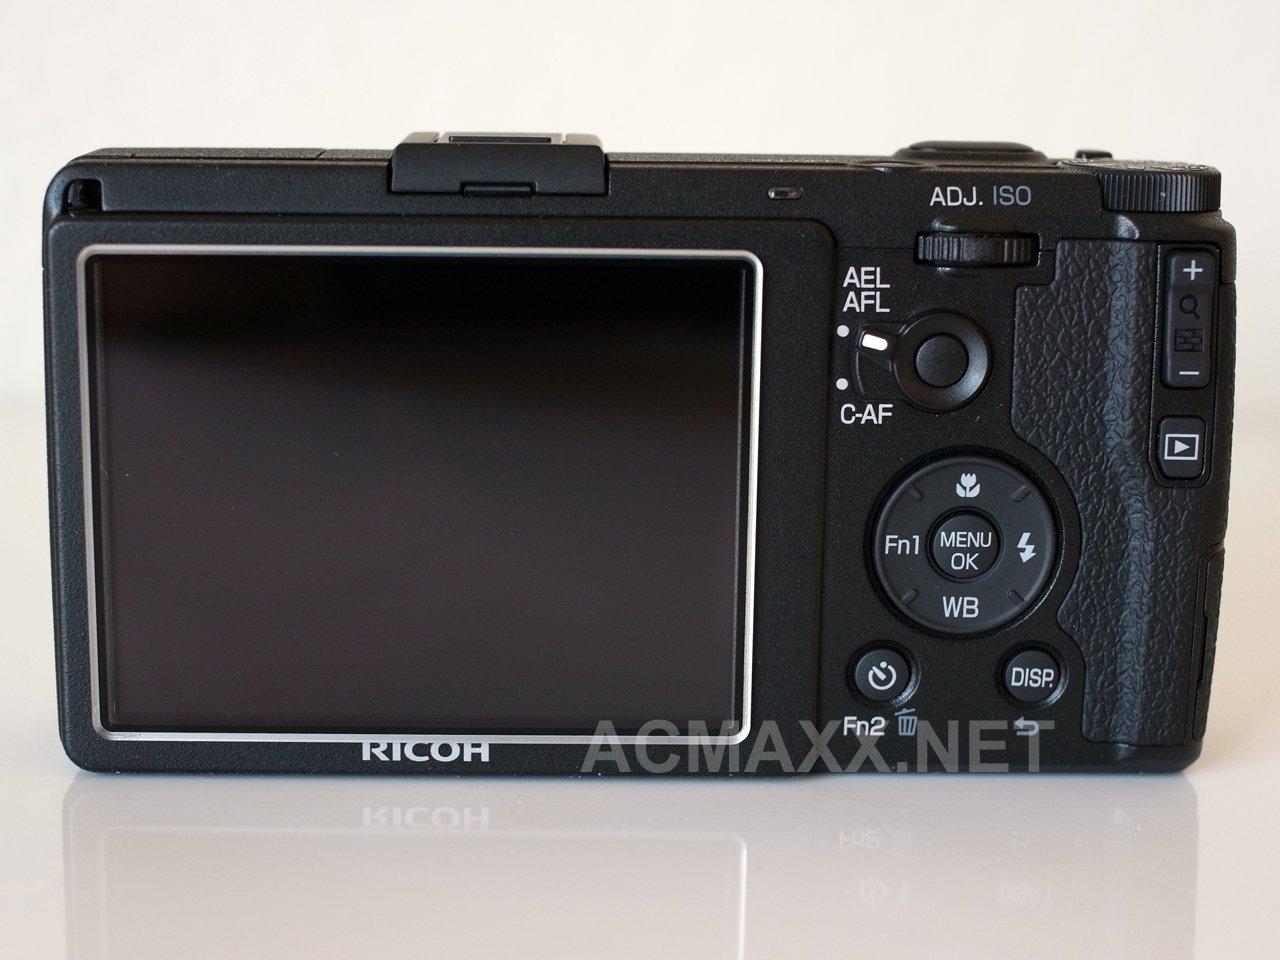 ACMAXX 3.0'' HARD LCD Screen ARMOR PROTECTOR for Ricoh GR 2013 / GR-II 2015 Digital Camera